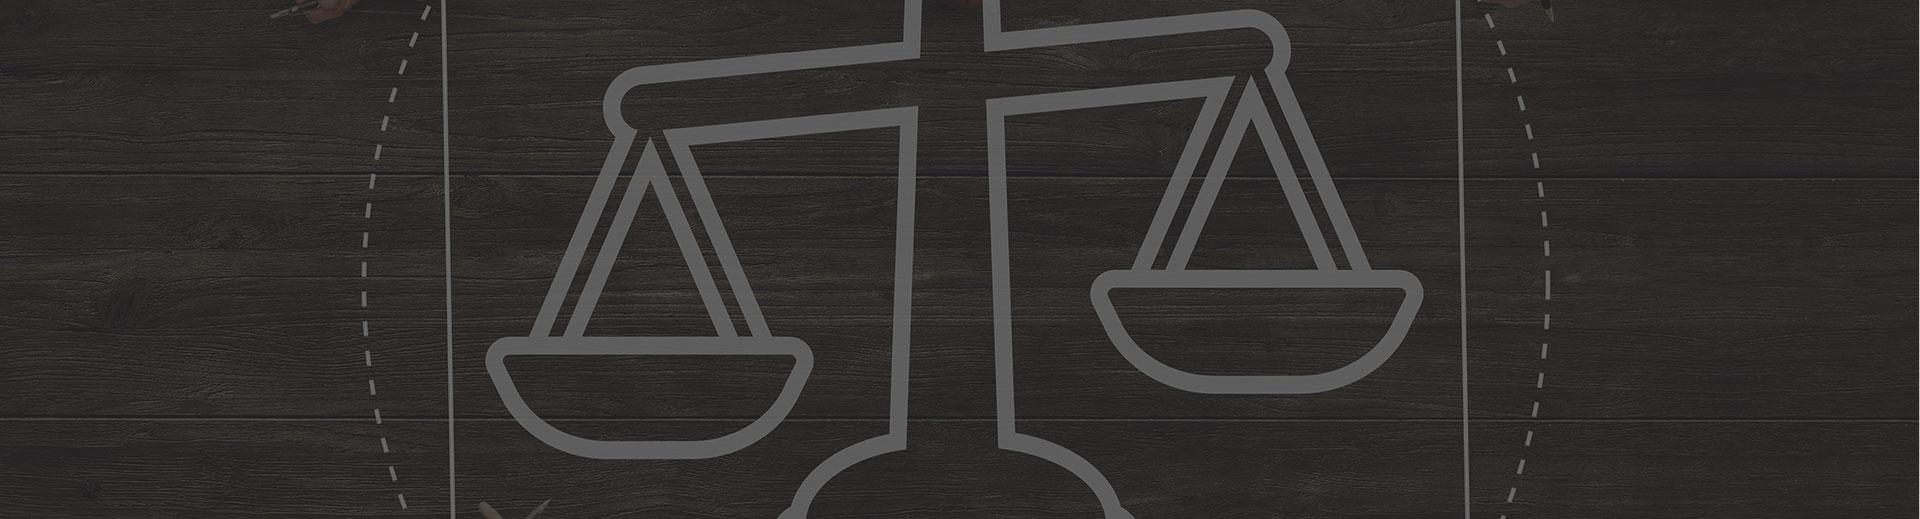 AVOCAT-DENISDEJARDIN-PAGE-ACTUALITE-banniere